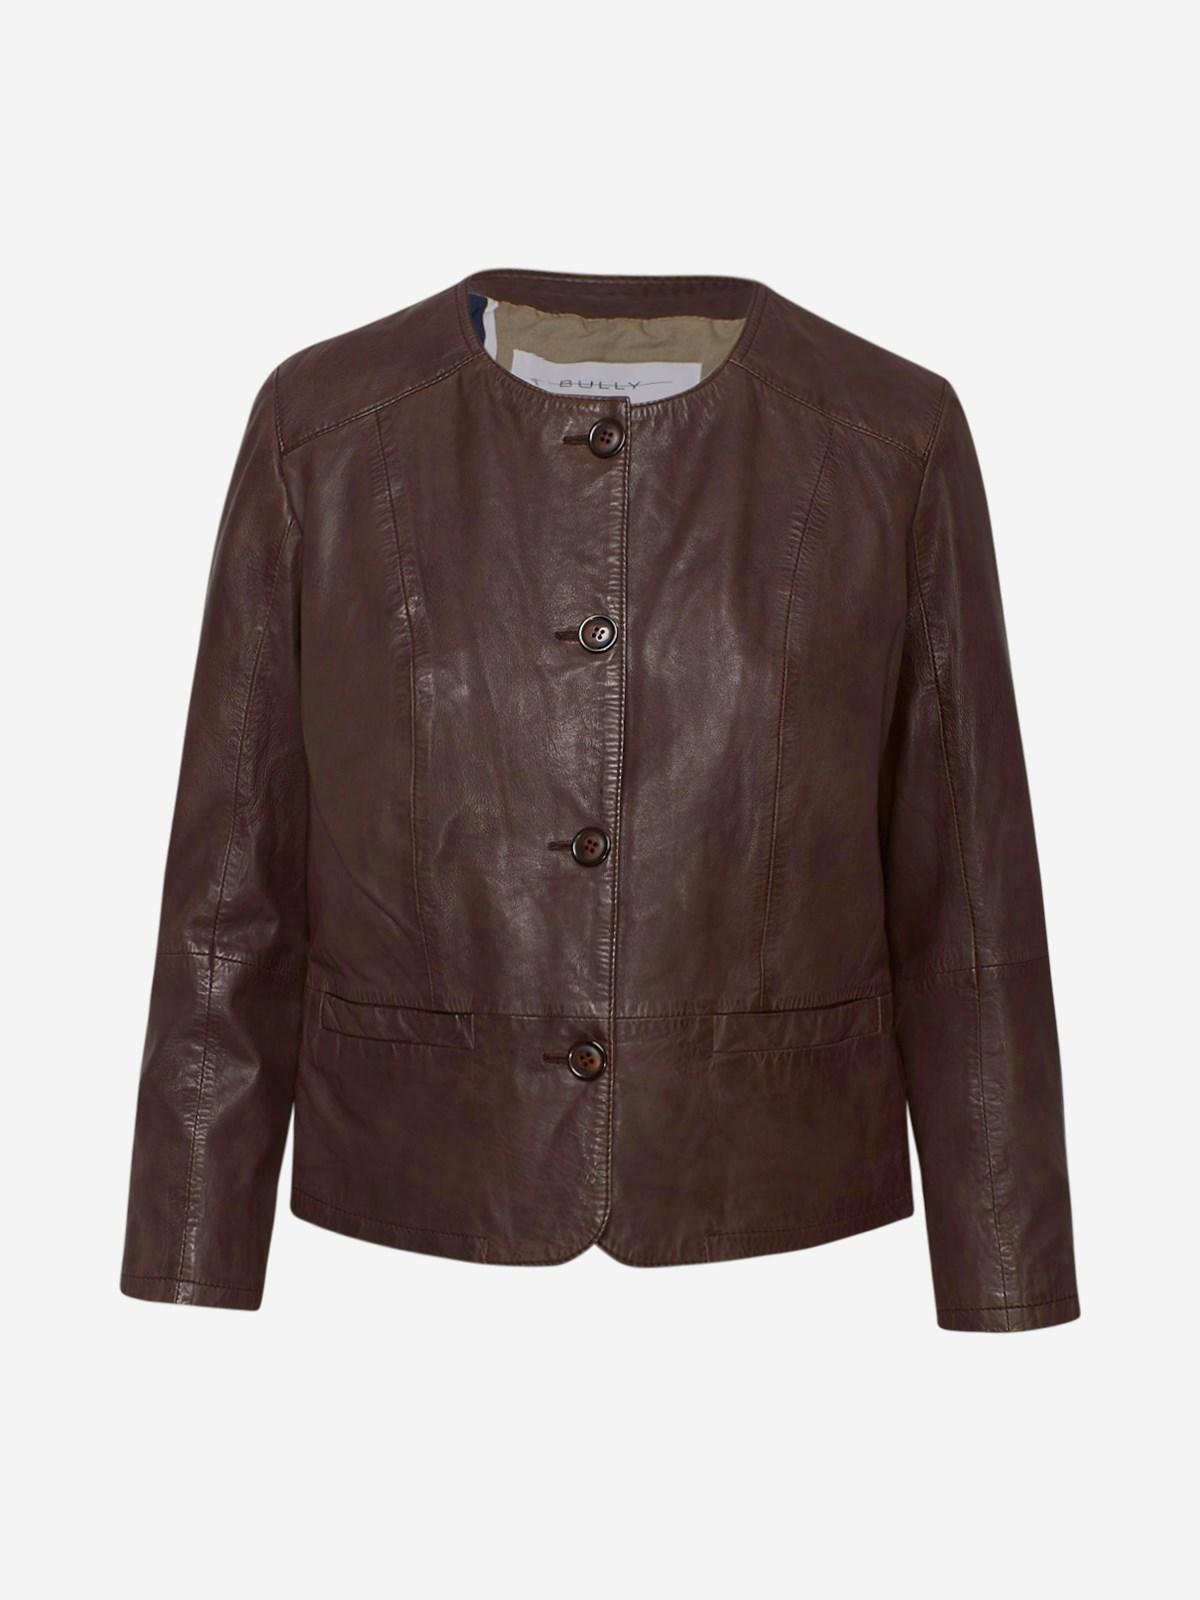 Bully Clothing BROWN JACKET